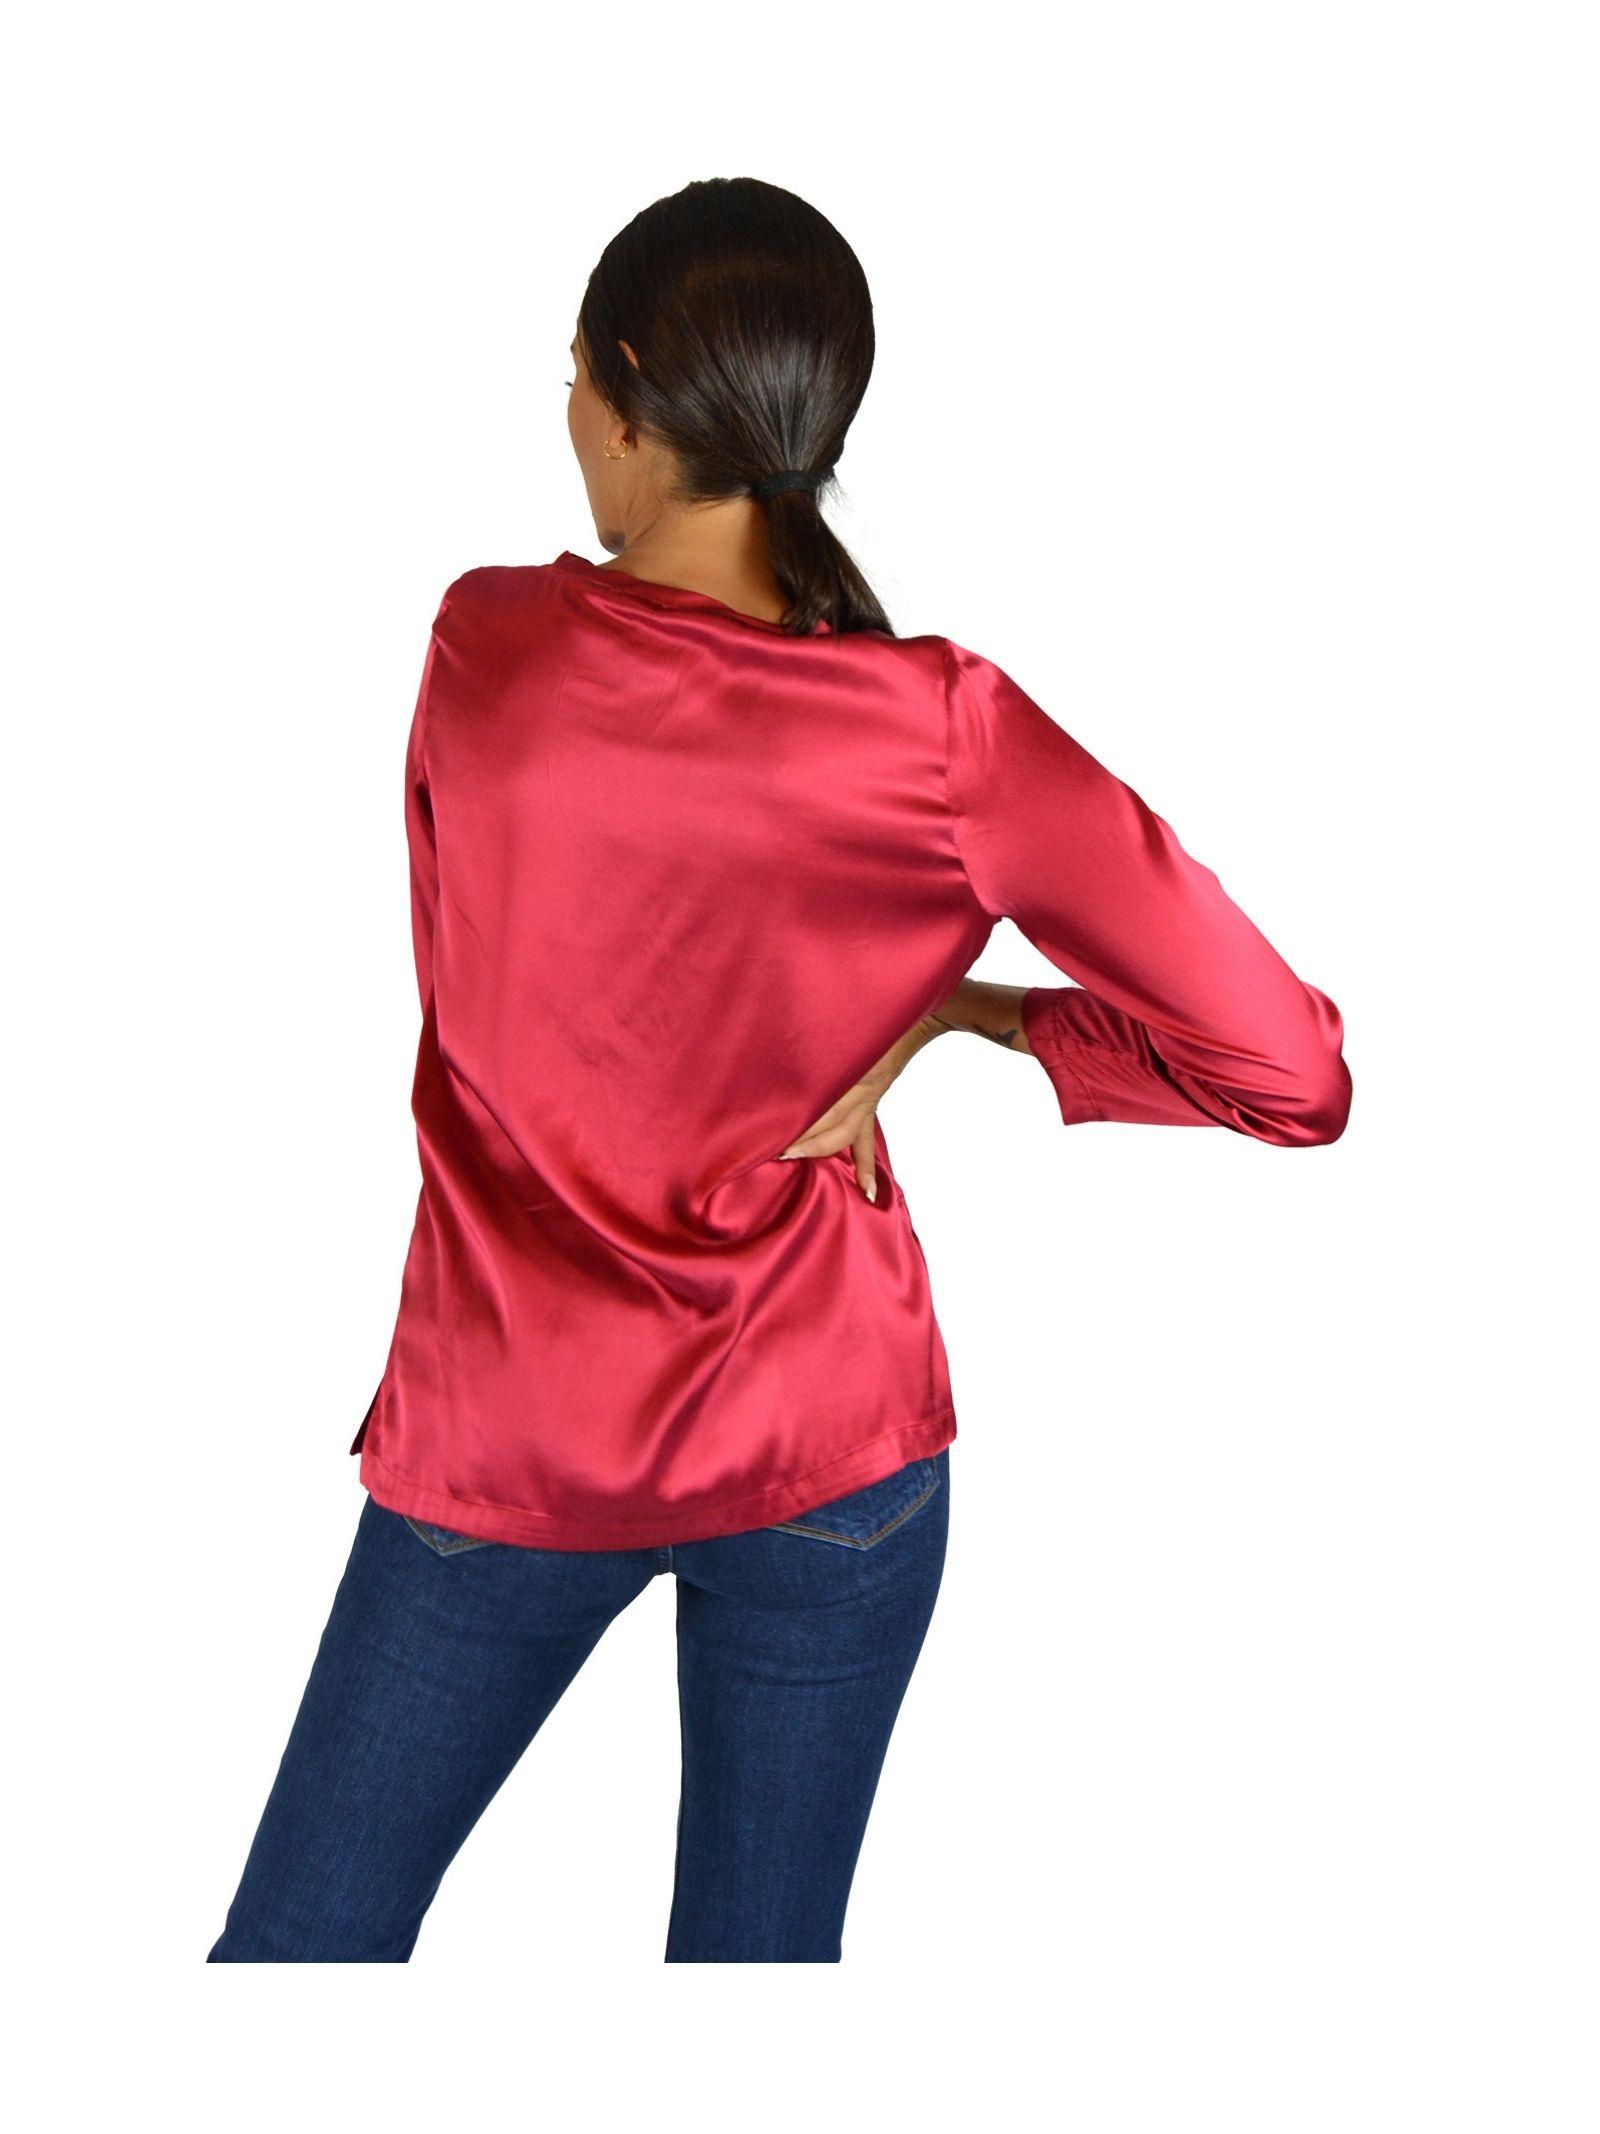 Ruby Woman T-shirt Maliparmi | Shirts and tops | JM40603102130032